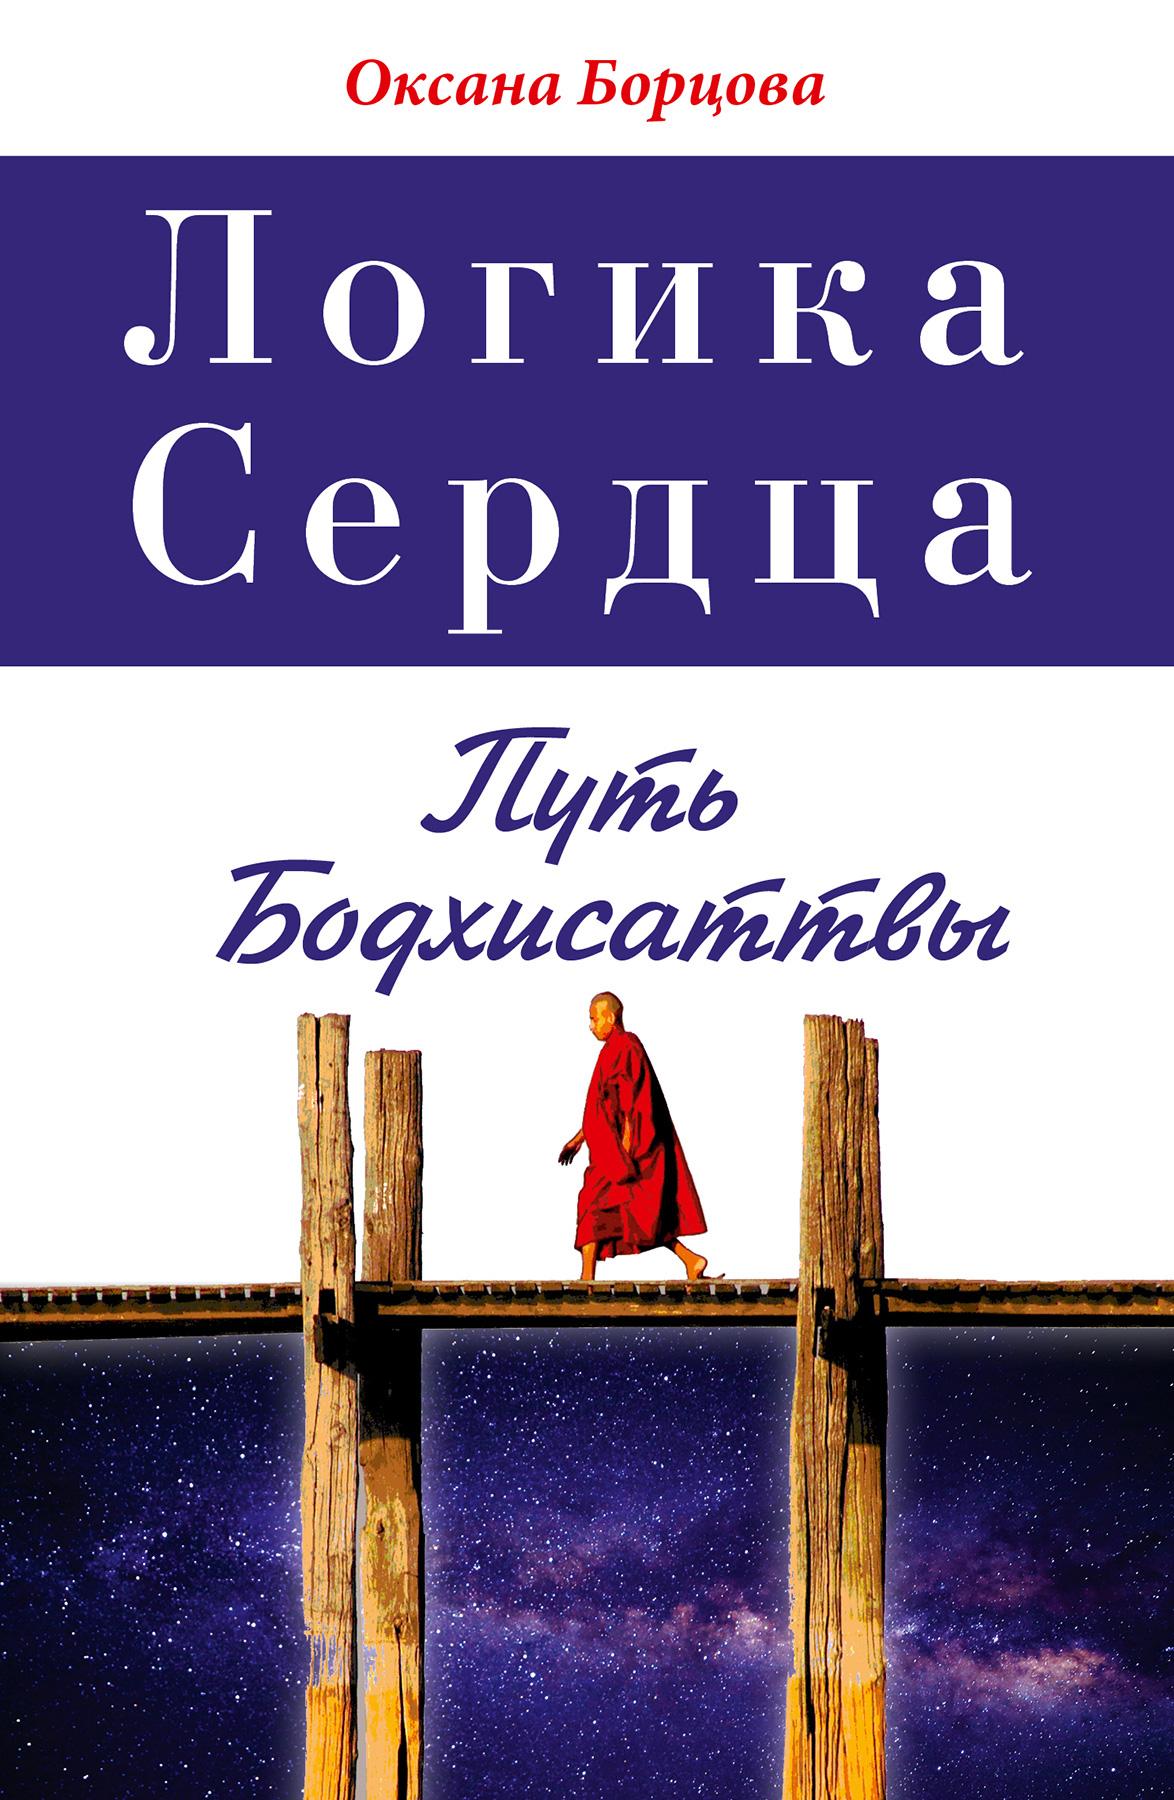 Оксана Борцова Логика Сердца. Путь Бодхисаттвы шантидева путь бодхисаттвы бодхичарья аватара